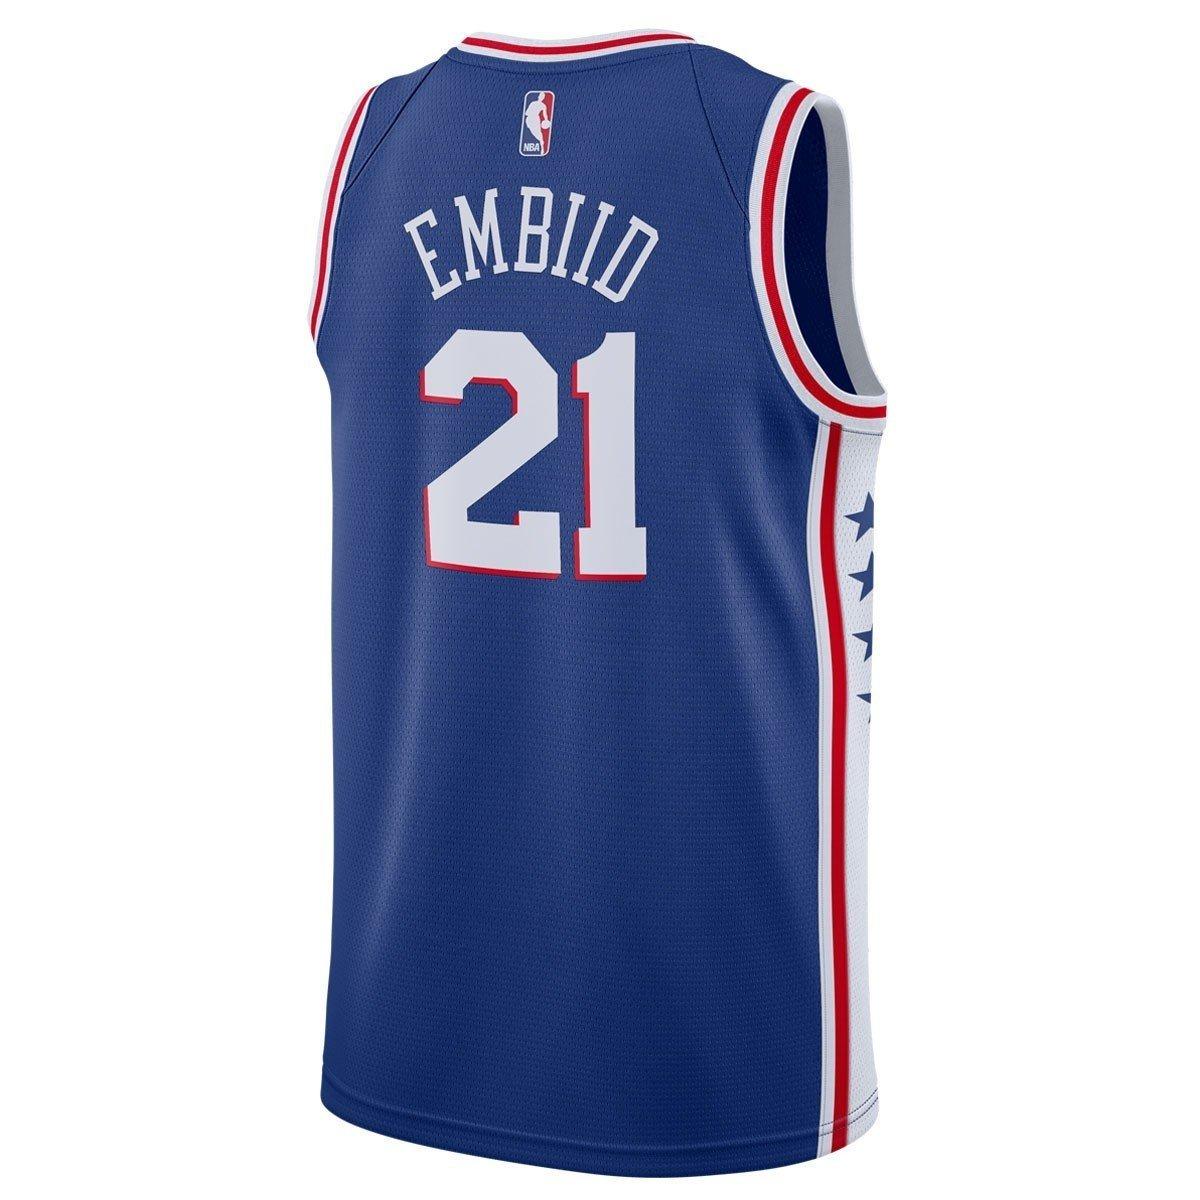 Koszulka młodzieżowa Nike NBA Philadelphia 76ers Joel Embiid Jersey